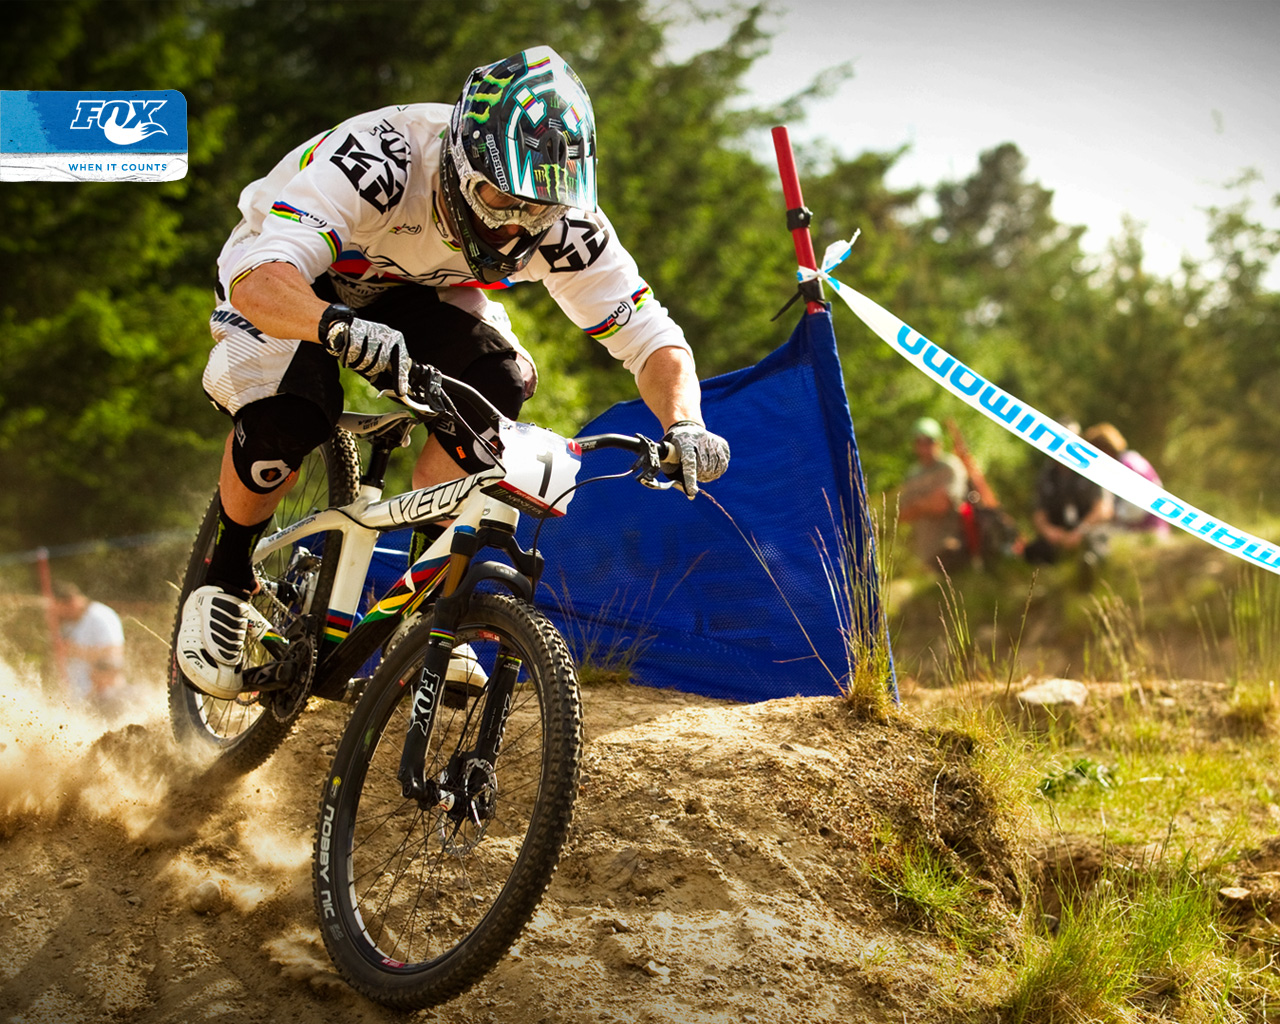 downhill moutain biking Page 8 1280x1024